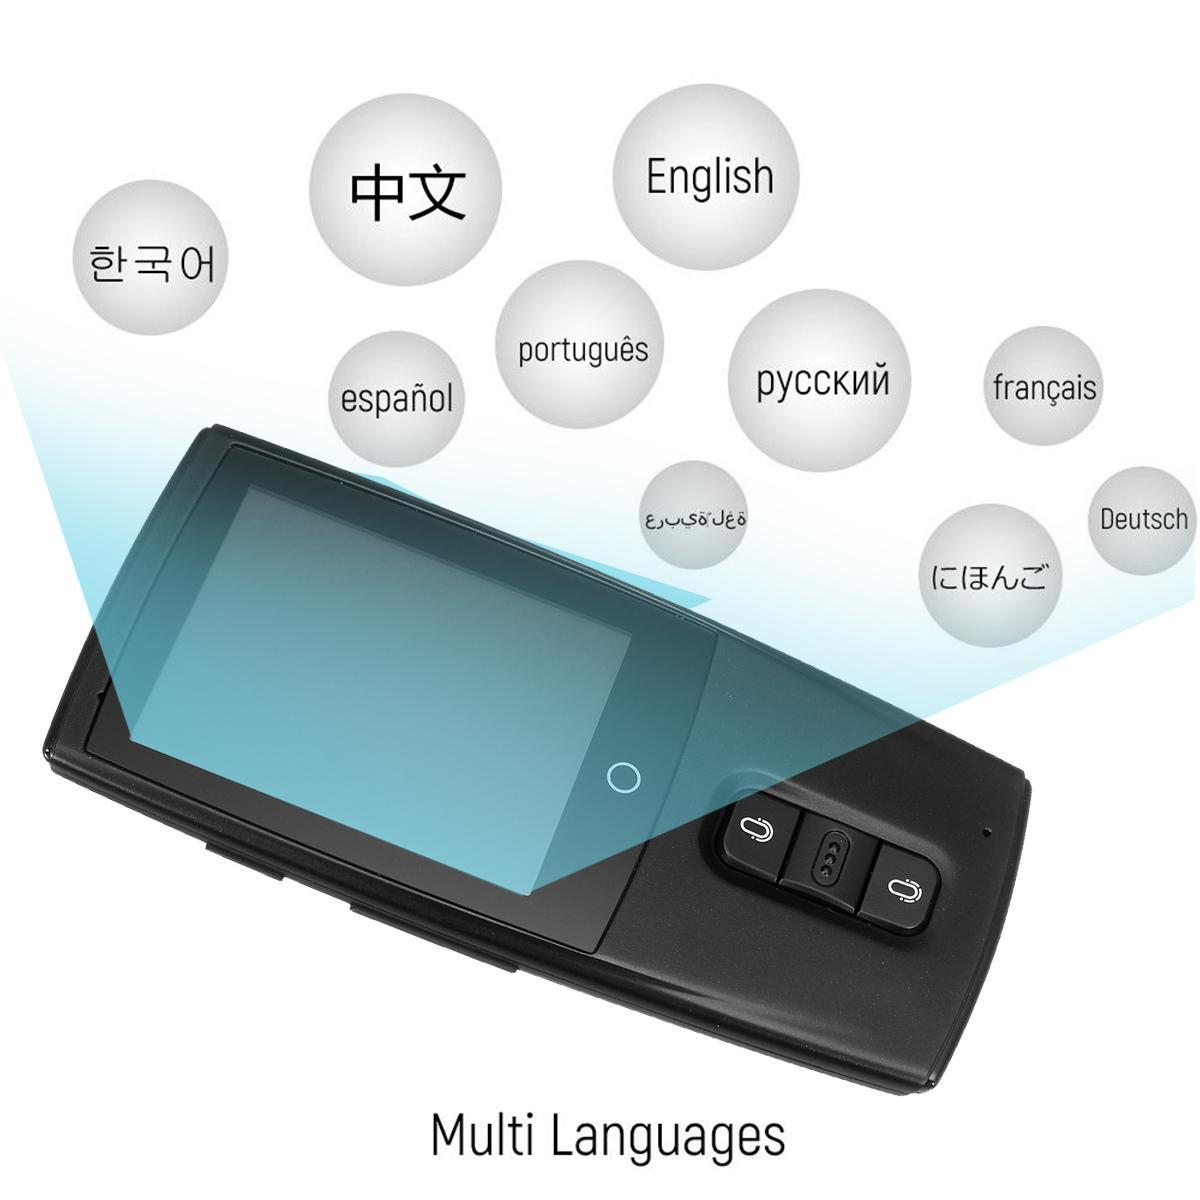 Voice Language Translator Device 43 languages Smart Two Way Translator WiFi  2 4 Touch Screen - Grey/black